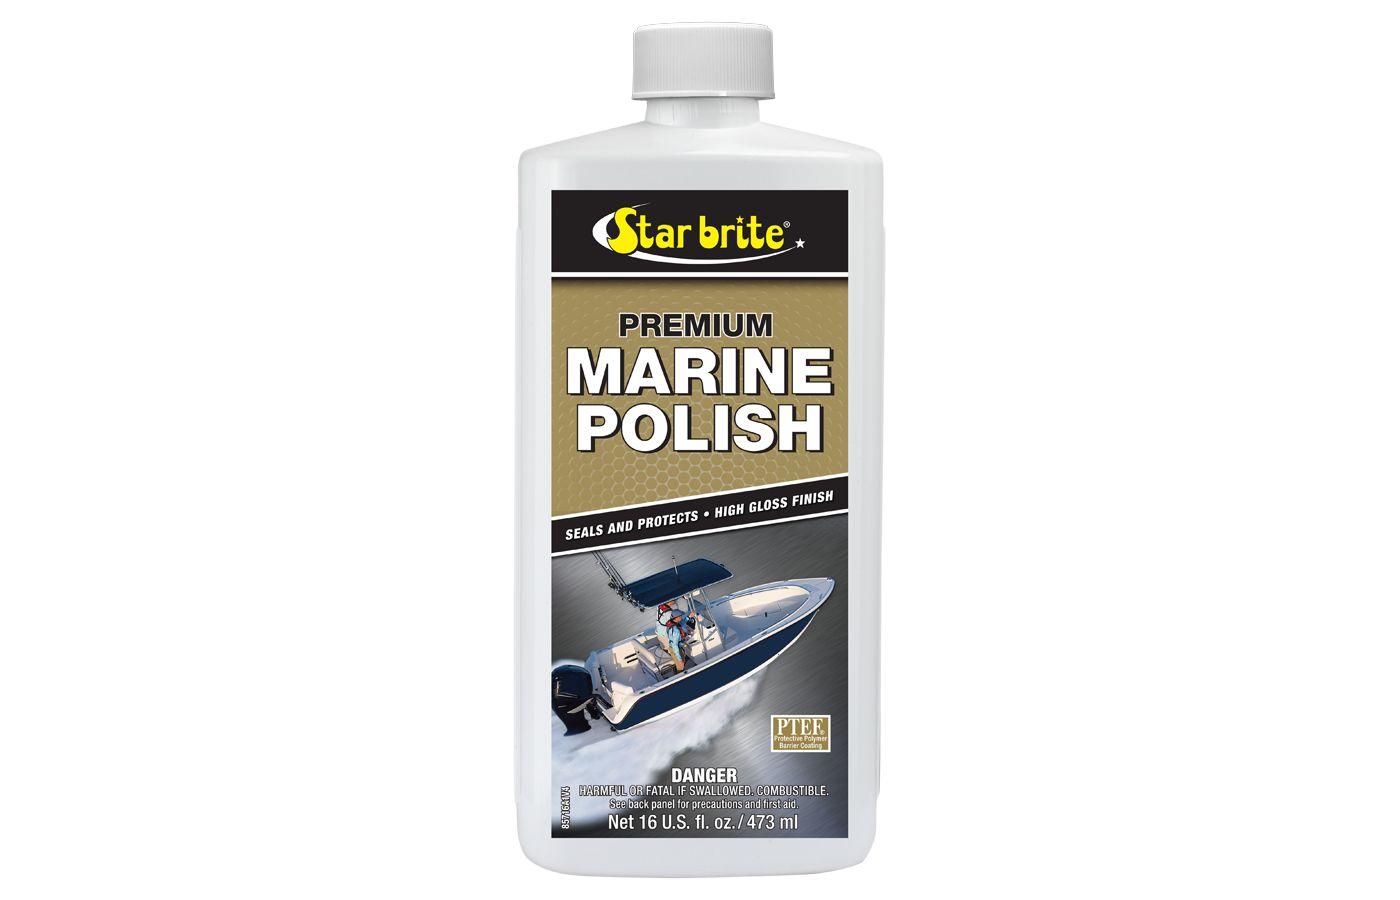 Star brite Premium Marine Polish